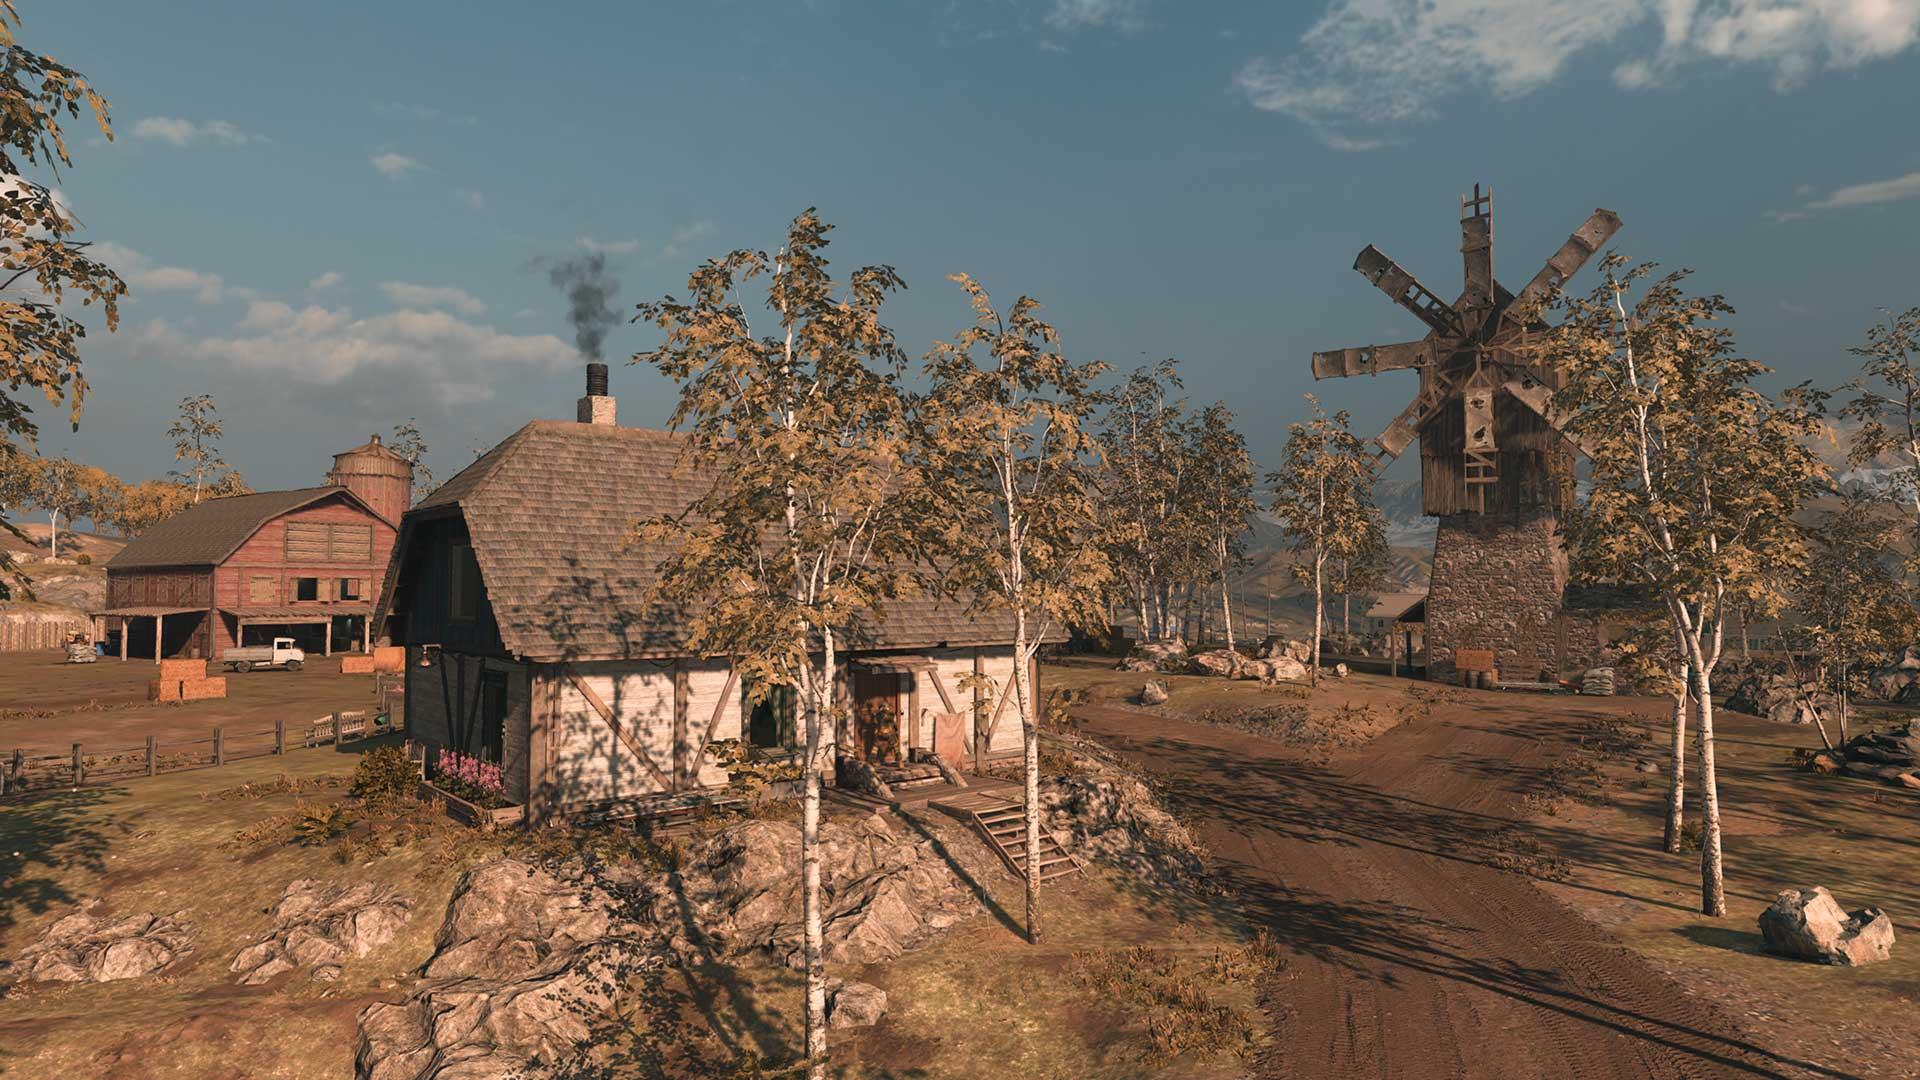 Who Would Tear Down Such a Beautiful Farm?